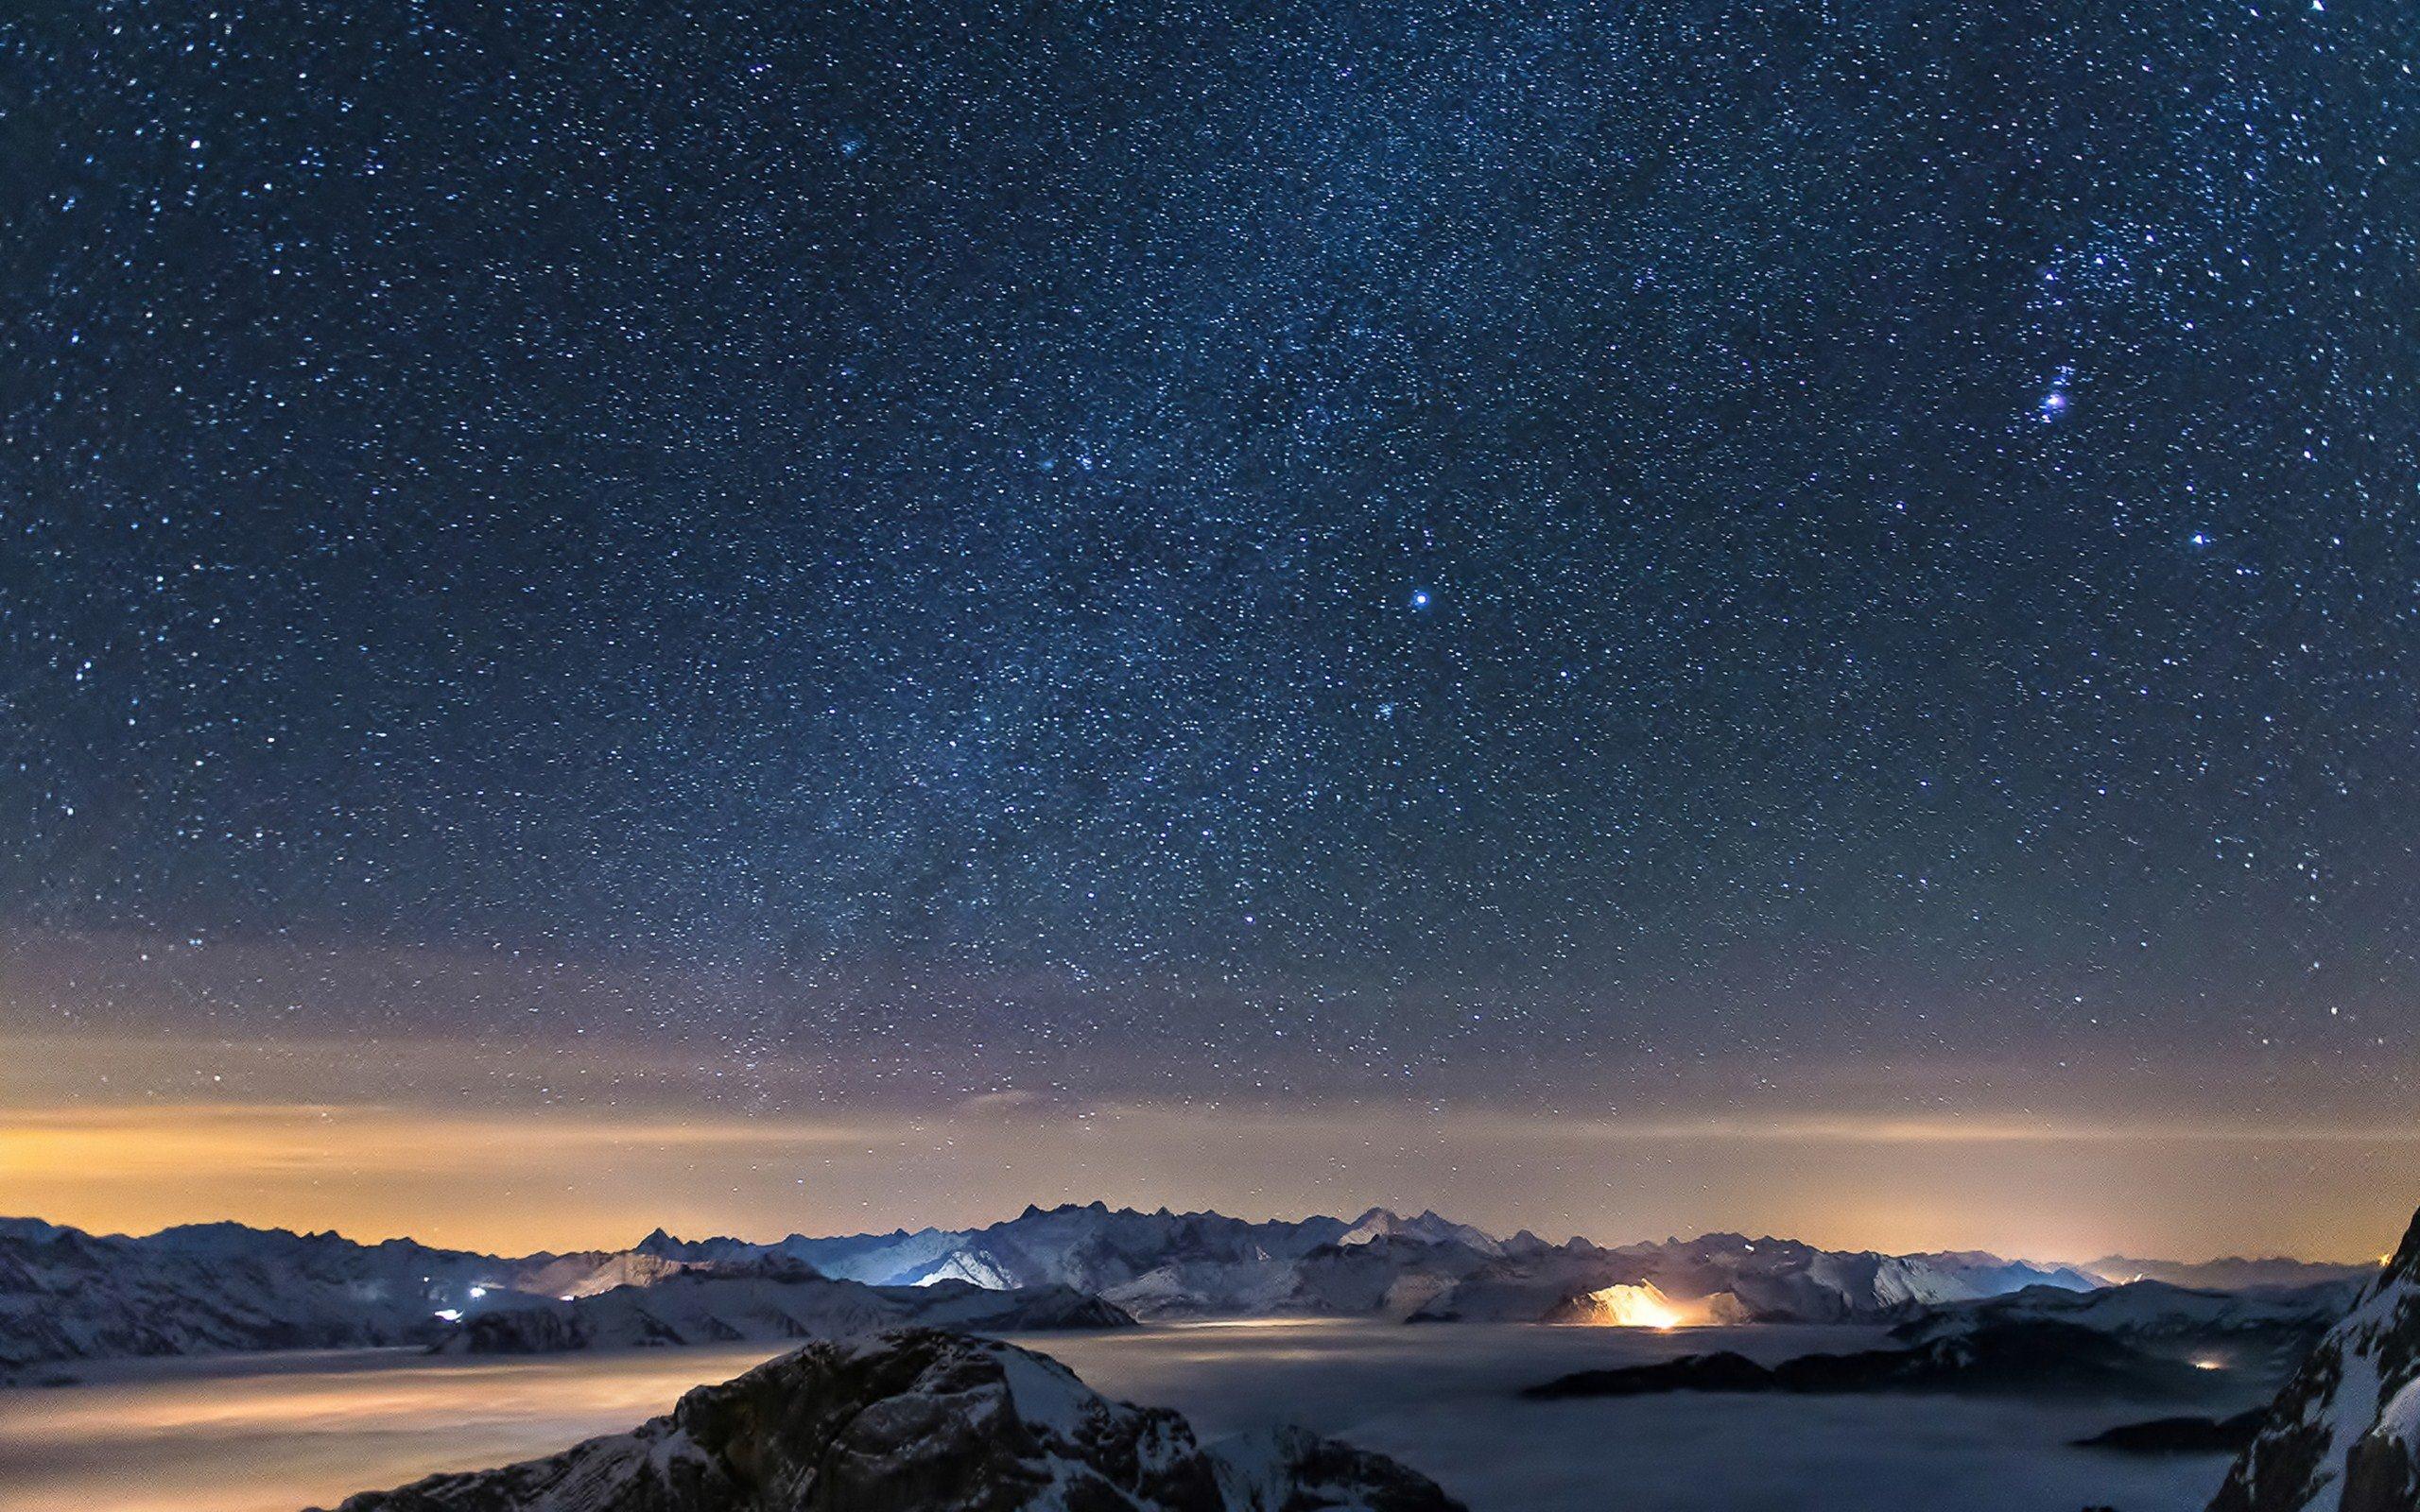 night landscape fog stars ultrahd 4k wallpaper wallpaper background 2560x1600